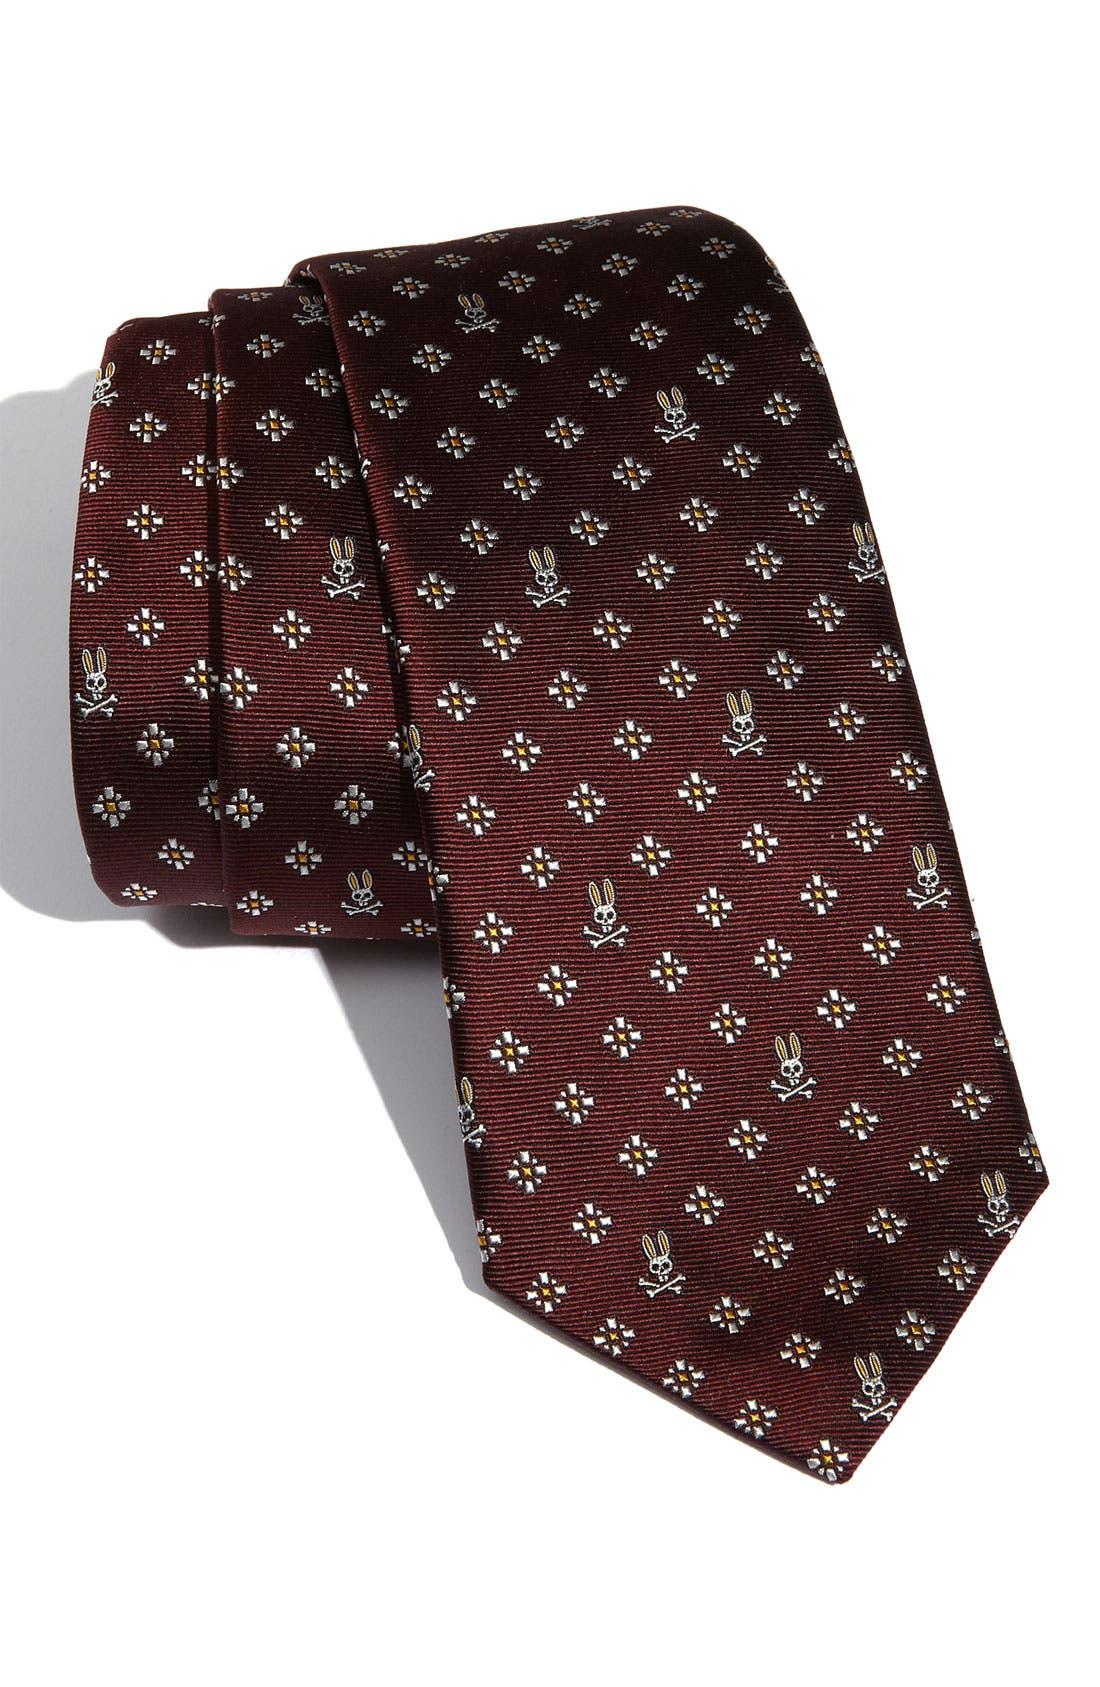 Alternate Image 1 Selected - Psycho Bunny 'Macclesfield' Woven Silk Tie